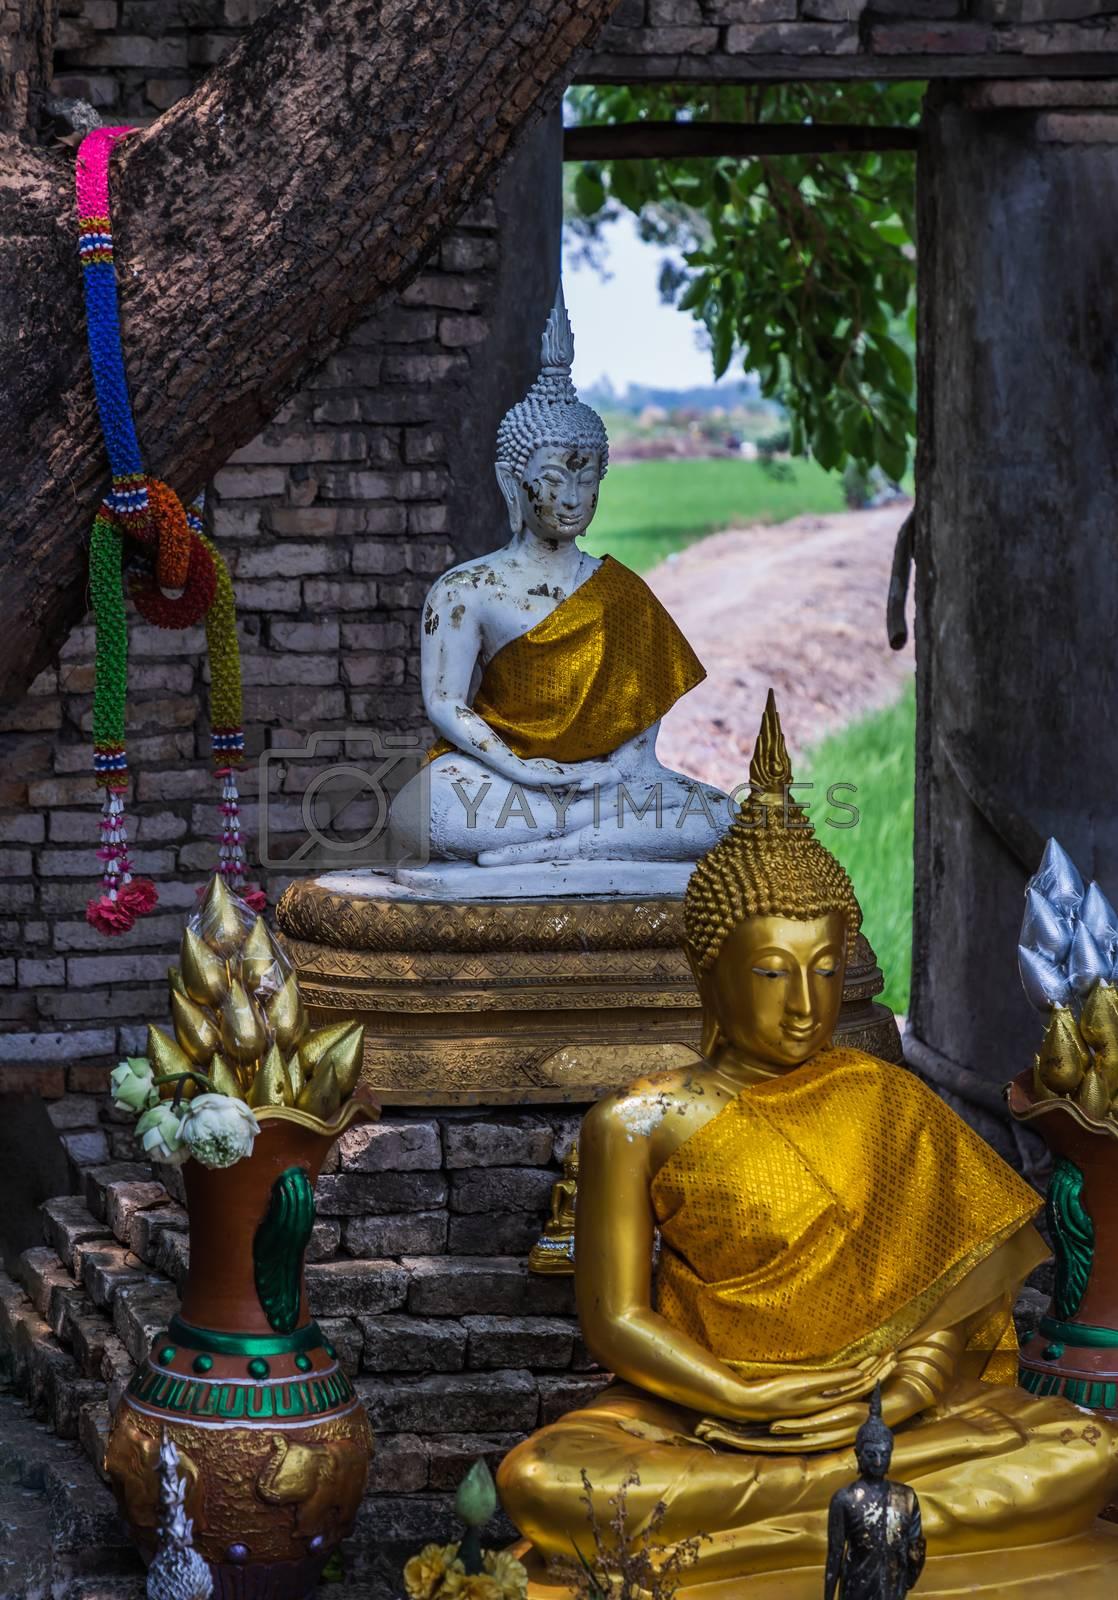 Nakhon Nayok, Thailand - Mar 21, 2020 : Buddha statue at The ancient of a 200 year old church. Wat Pah Krathum. Selective focus.